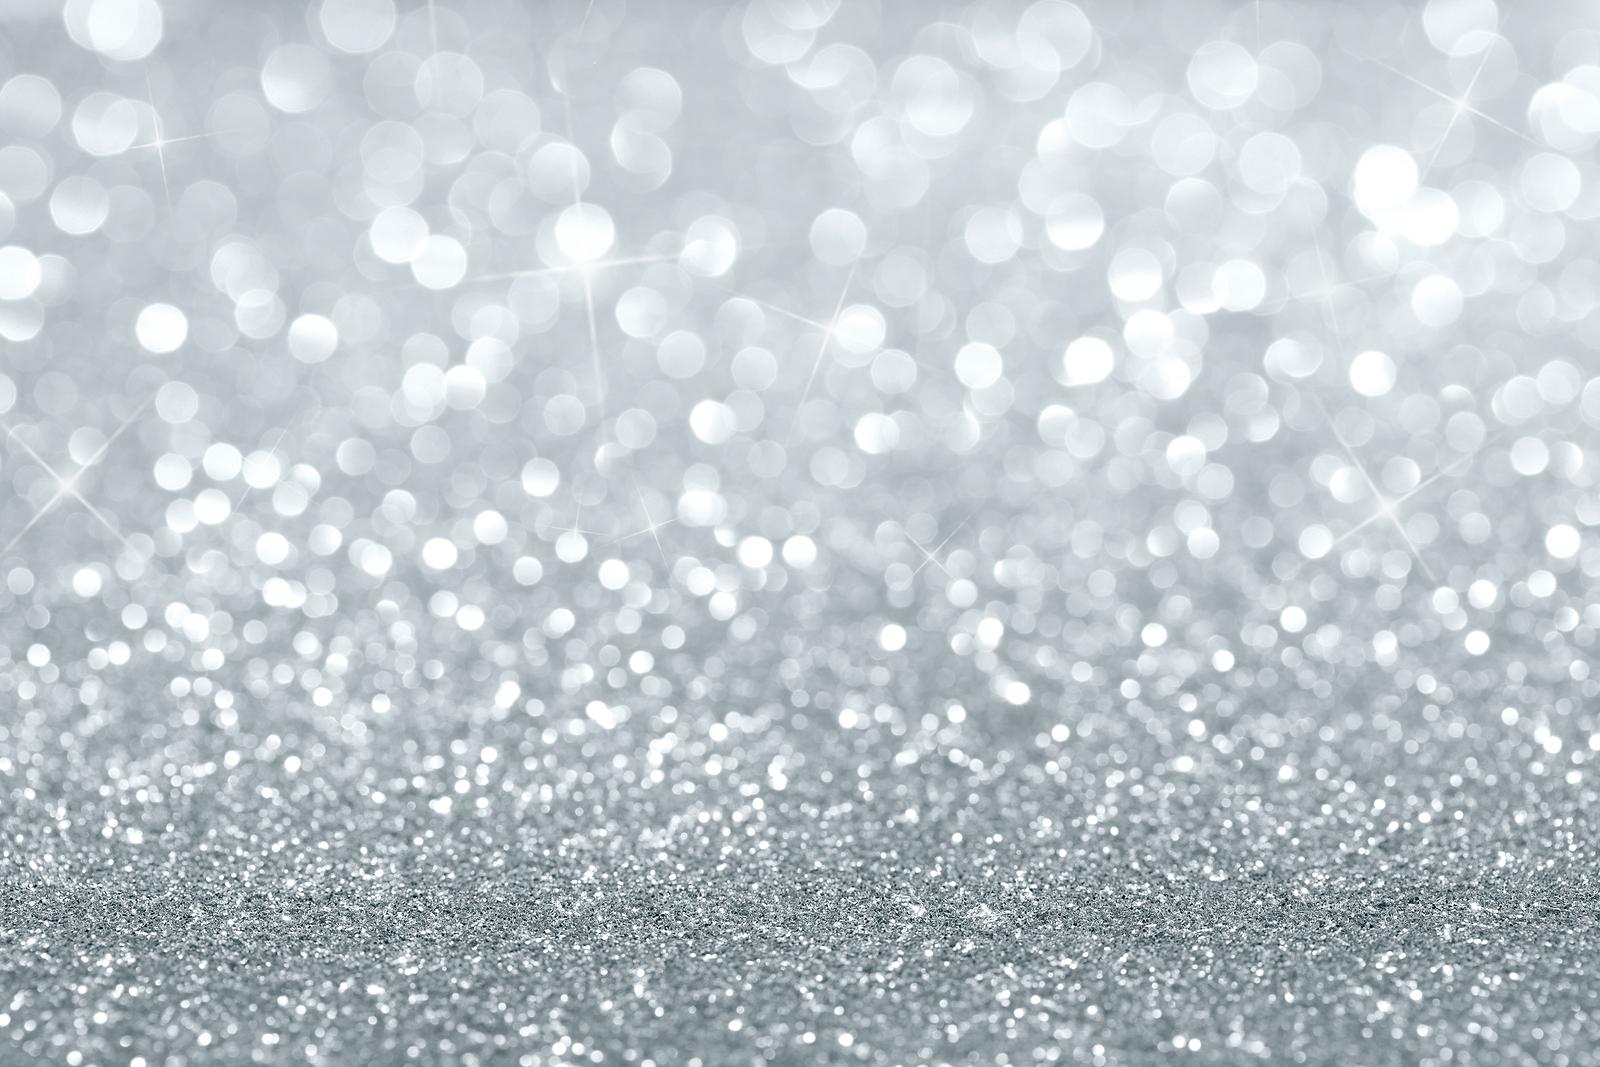 Silver Glitter Desktop Backgrounds   HD Wallpapers 1600x1067